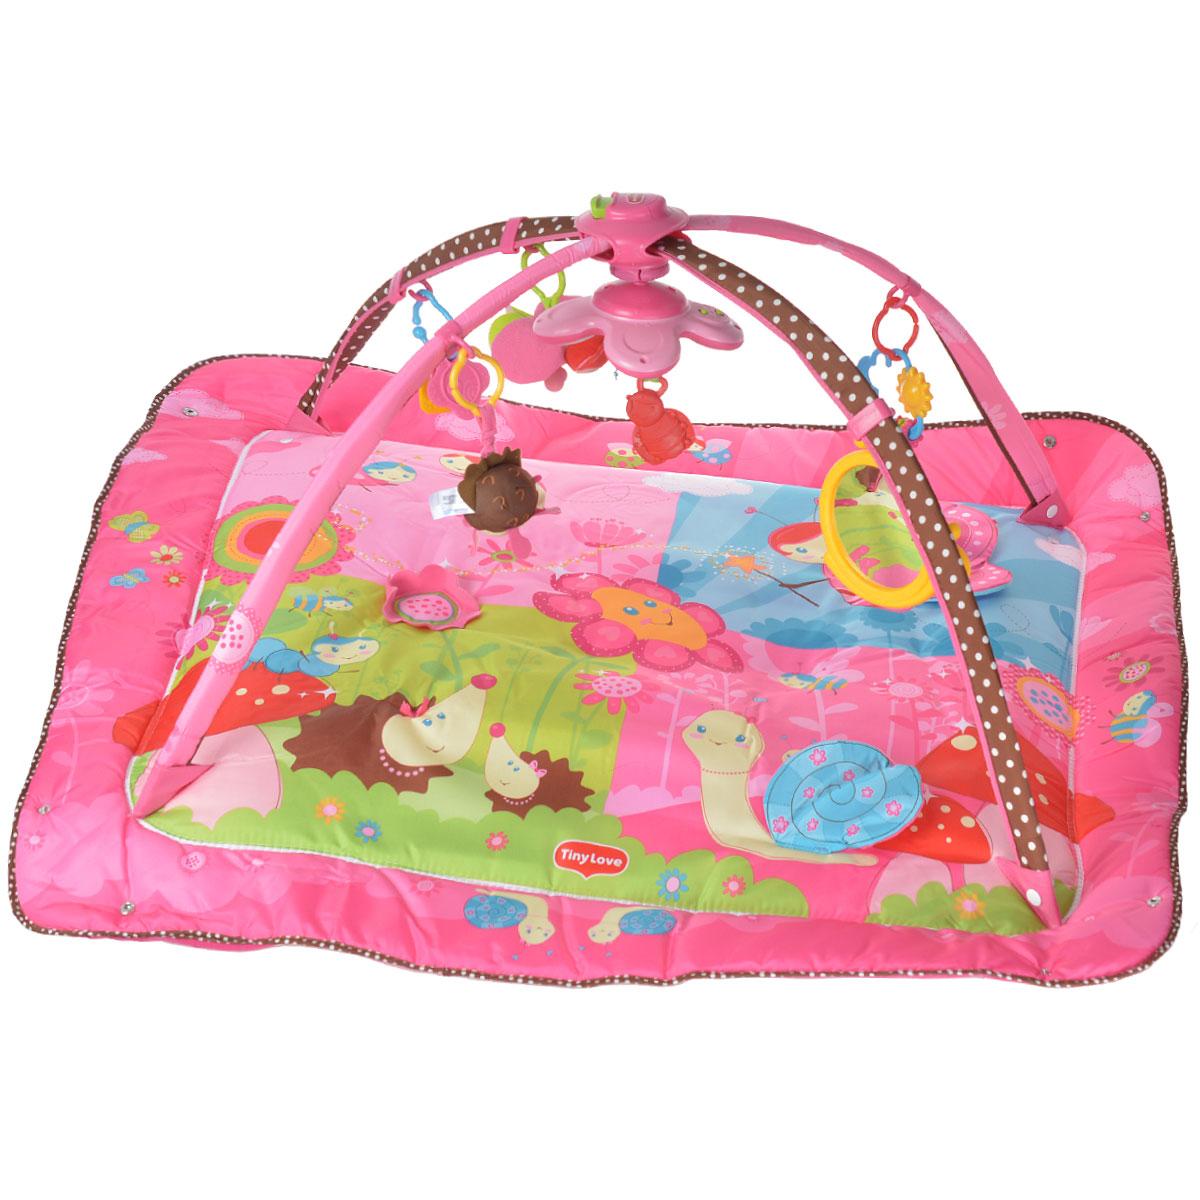 "Развивающий  коврик ""Моя принцесса"", 5 в 1, цвет: розовый, Tiny Love"